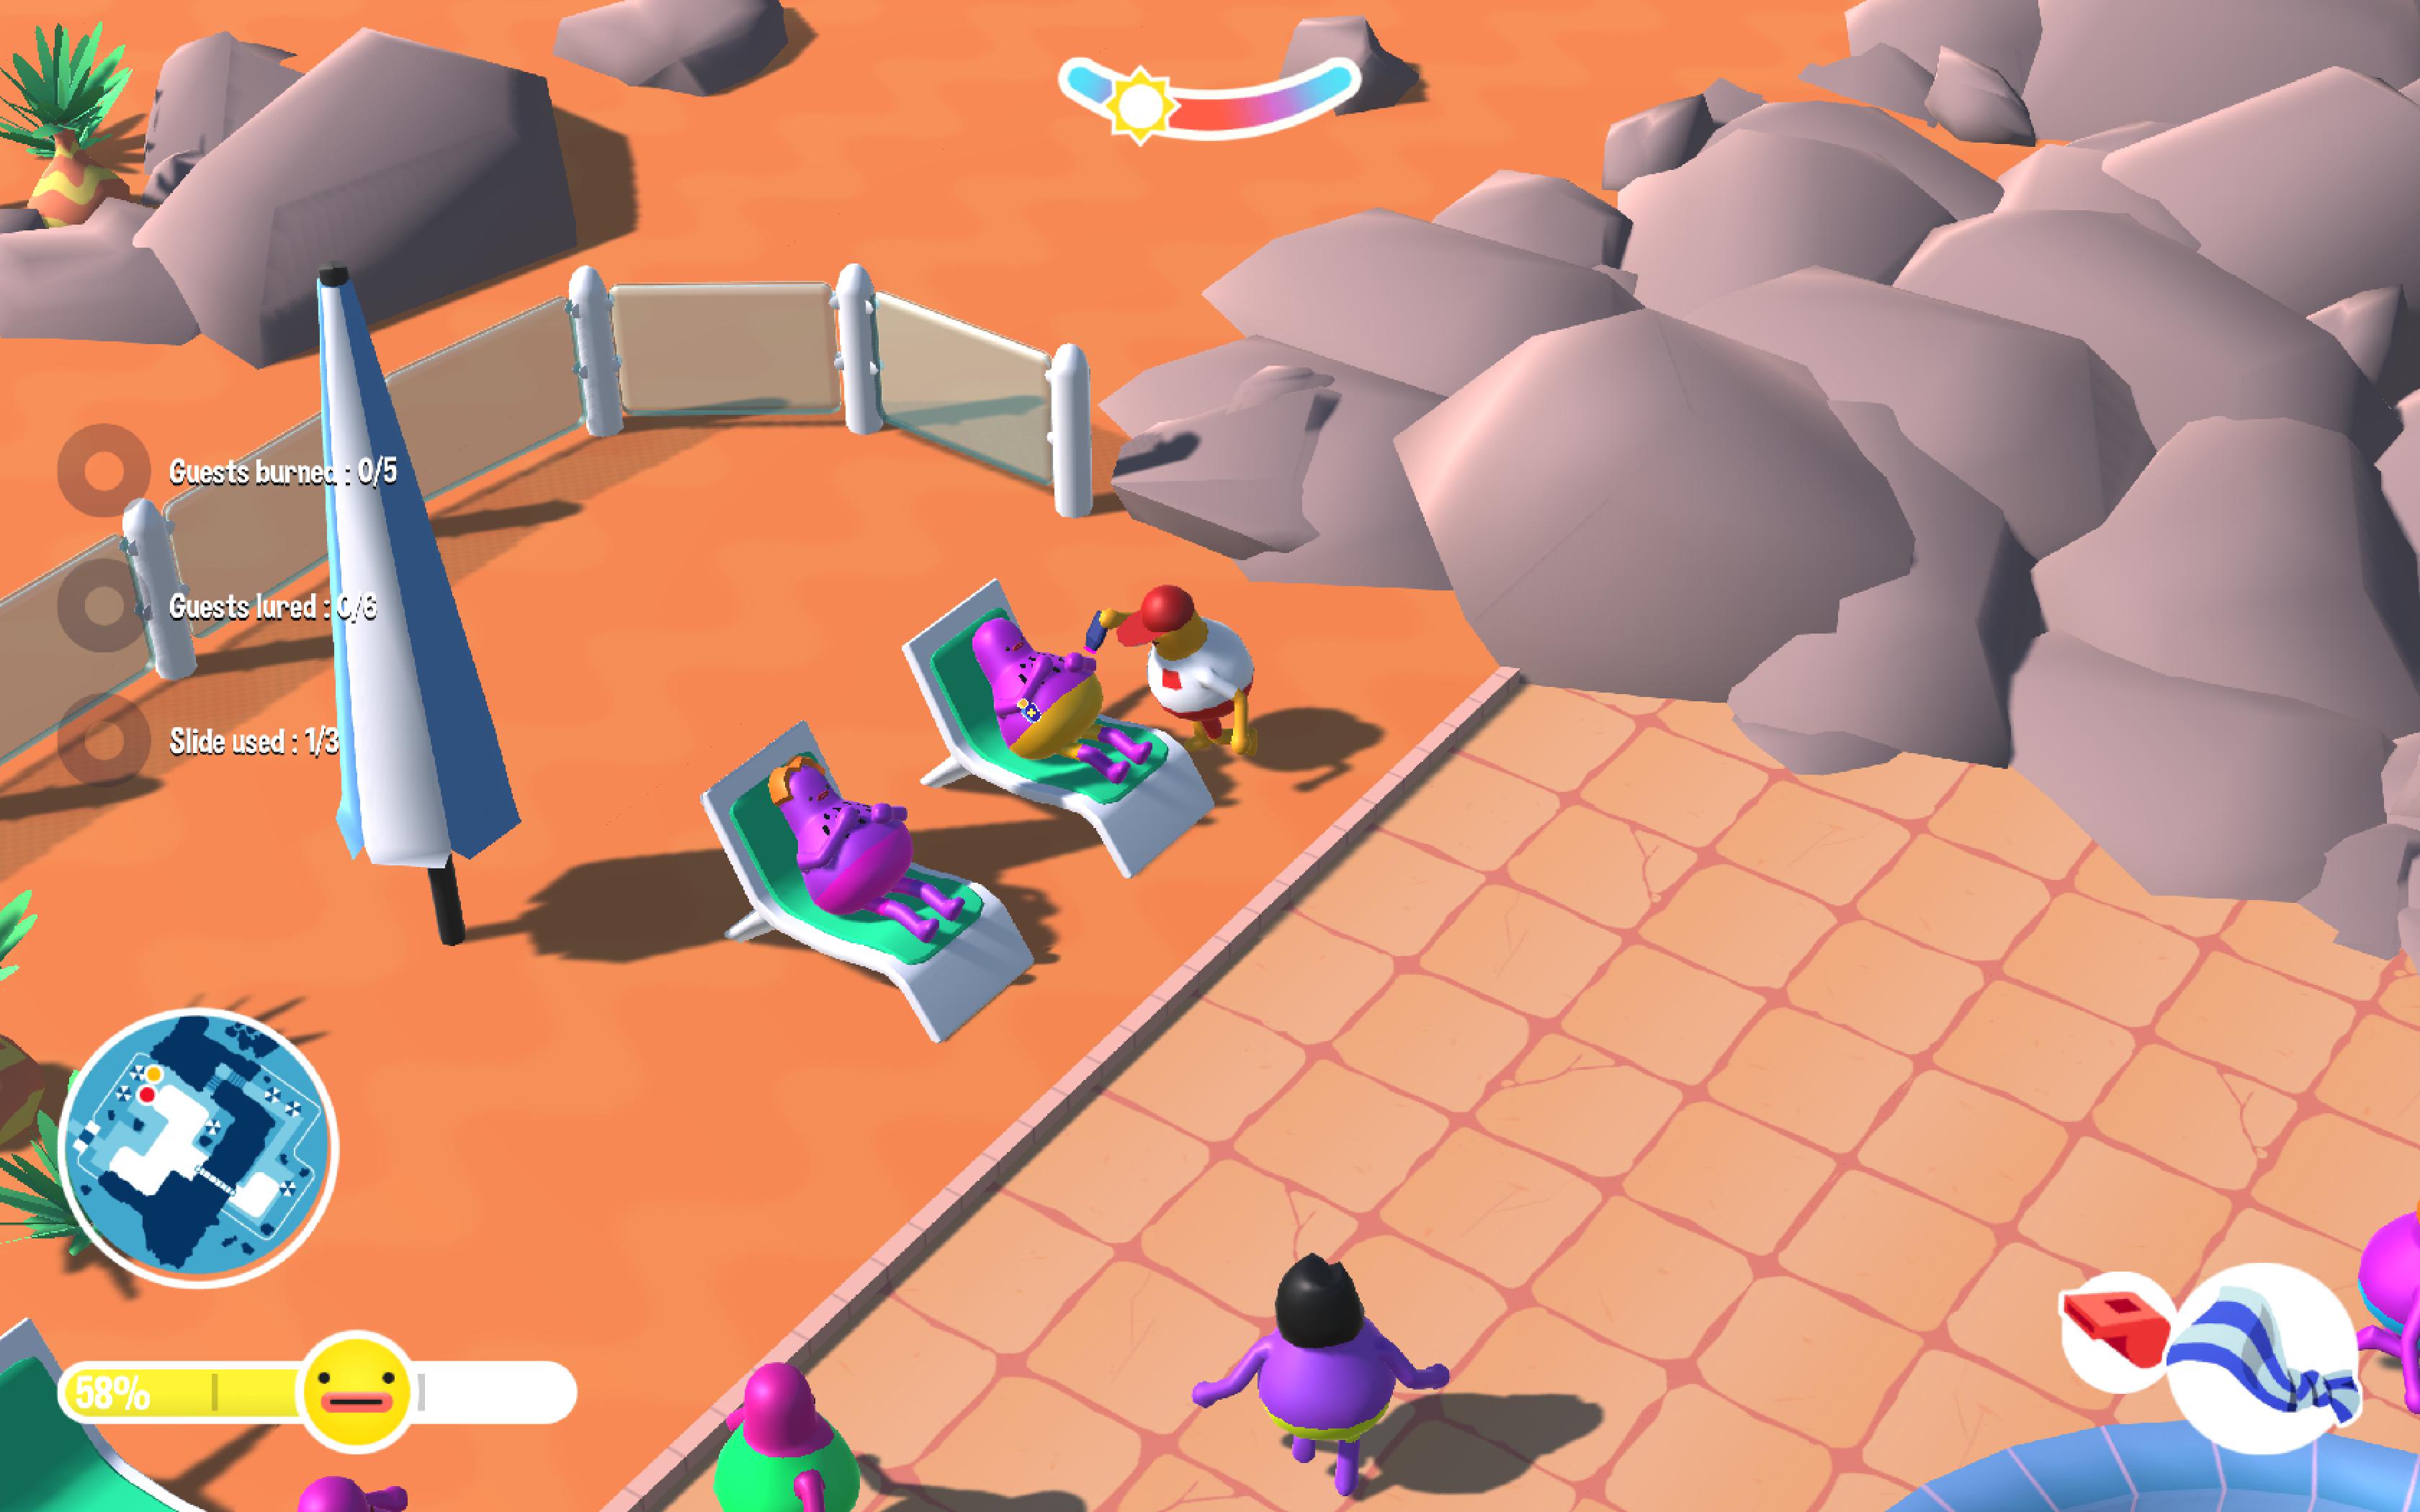 PoolPartyPanic_screenshot3.png